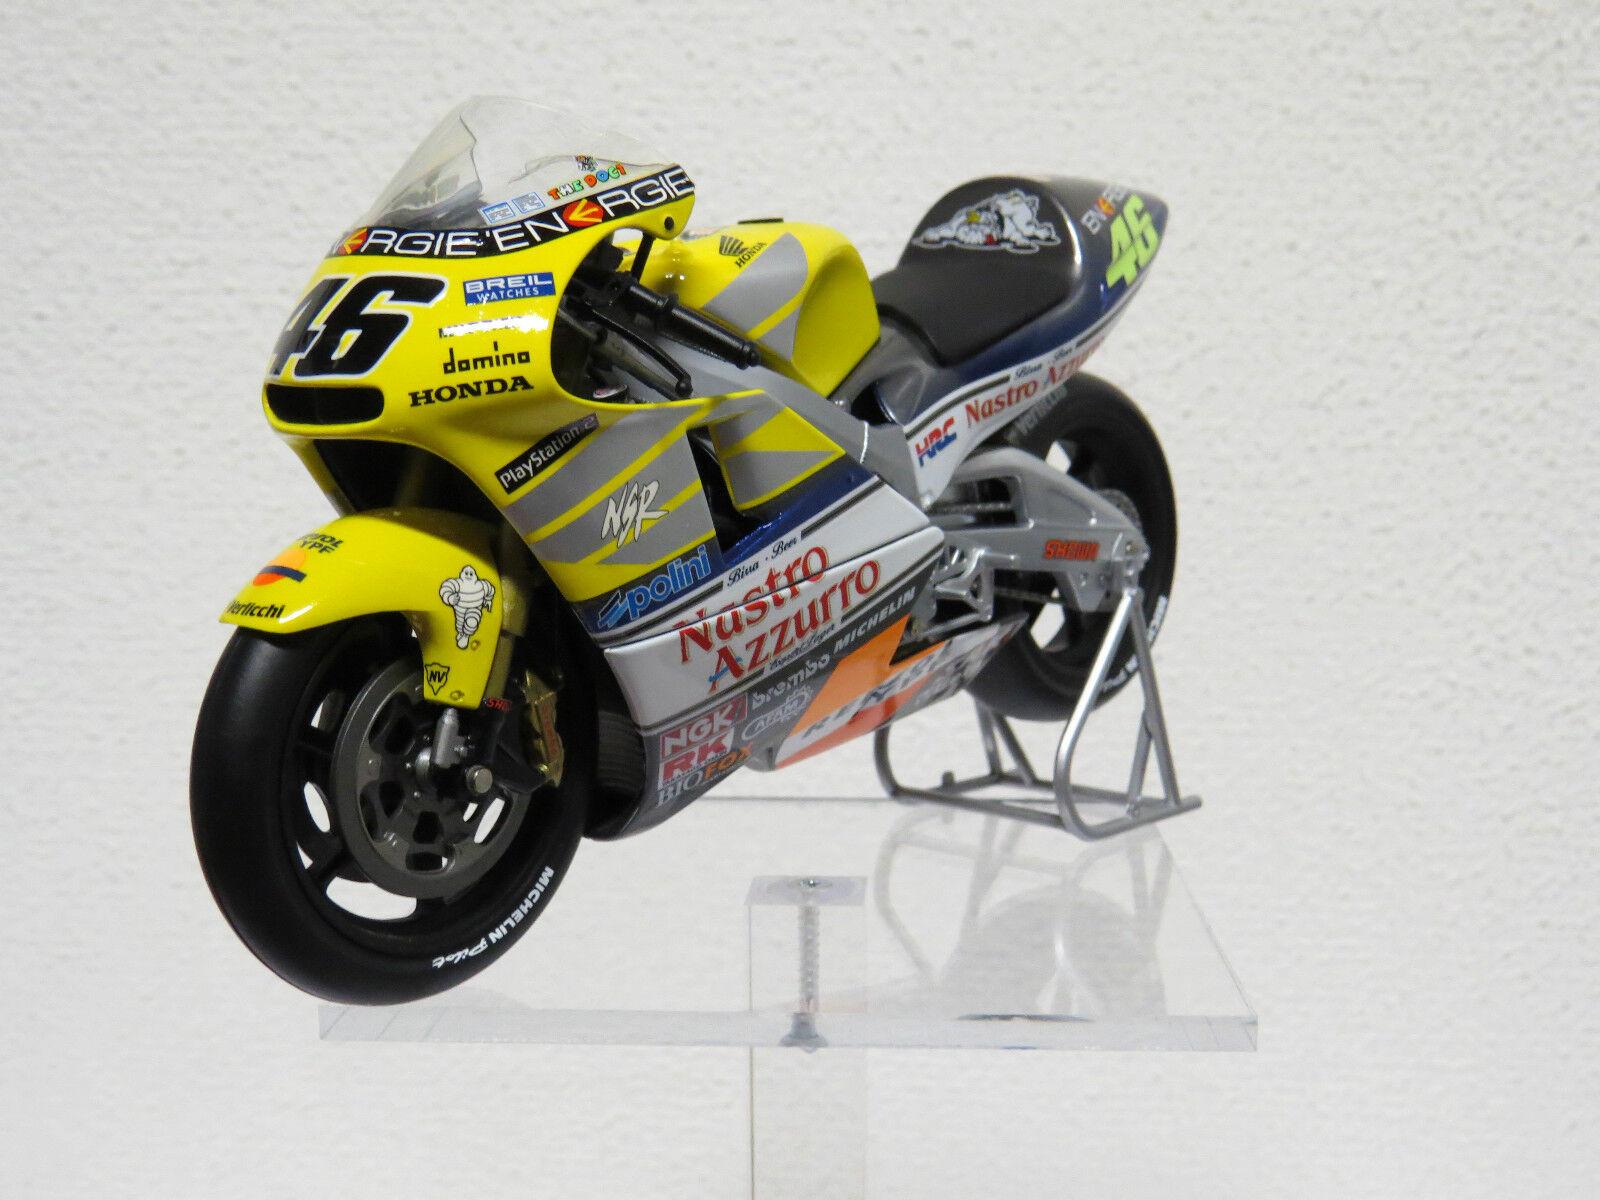 Honda NSR  500cc GP 2001 Valentino Rossi 46 1 12  Minichamps Nr. 122 016146